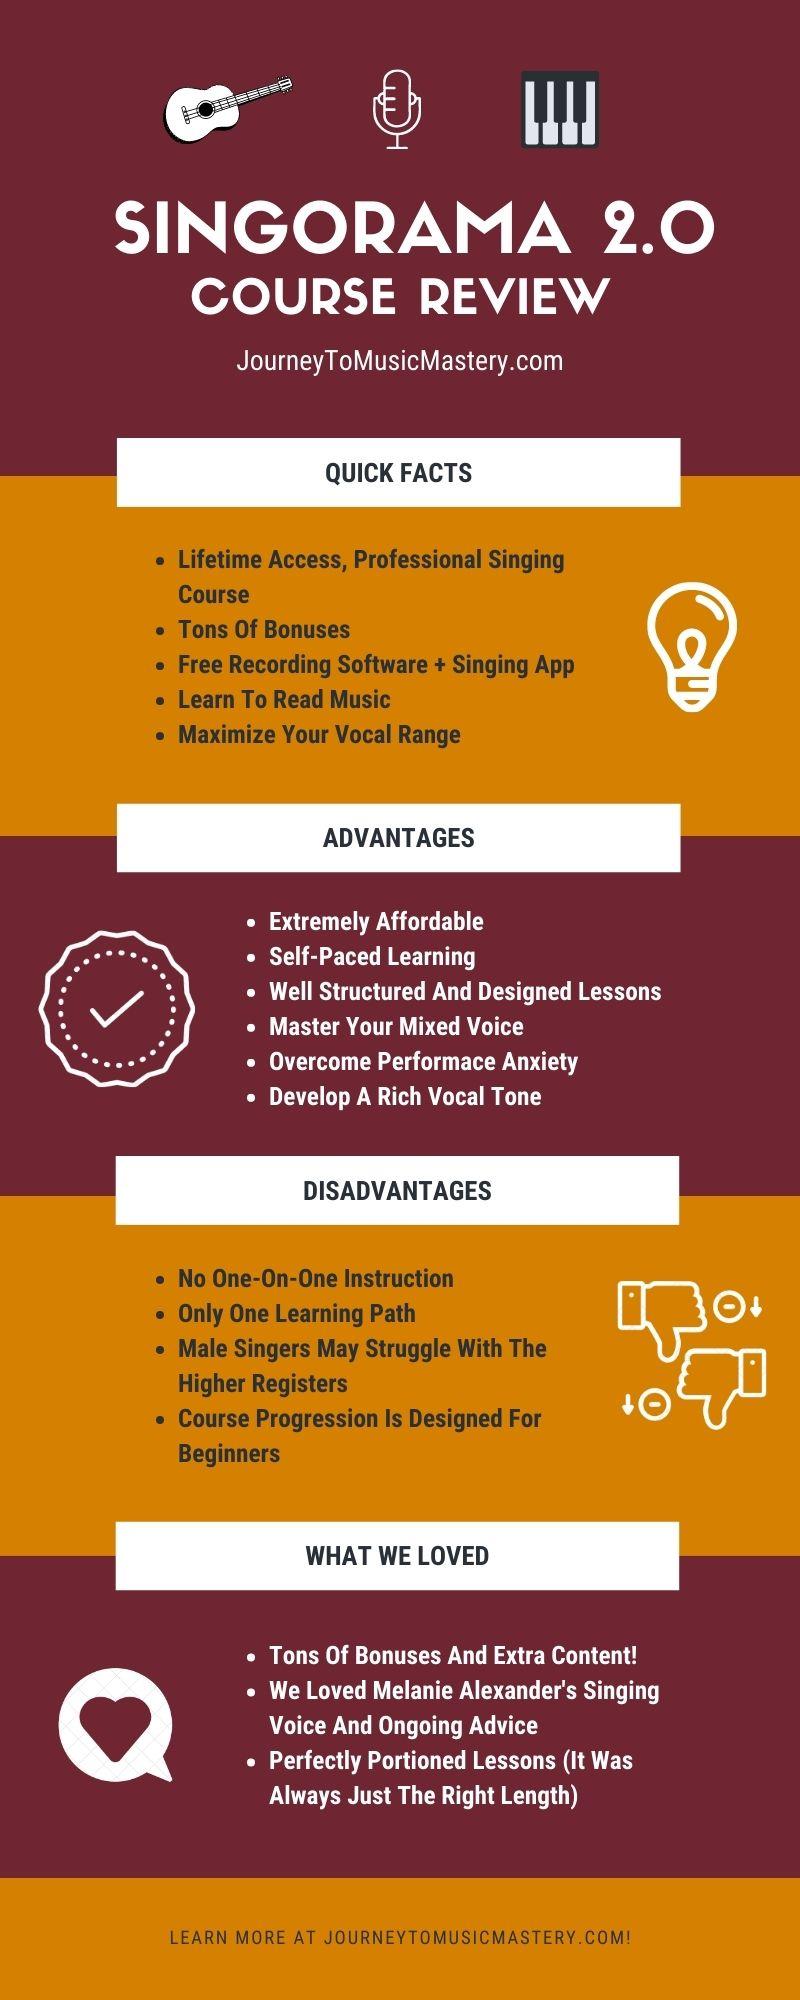 Singorama Review Infographic